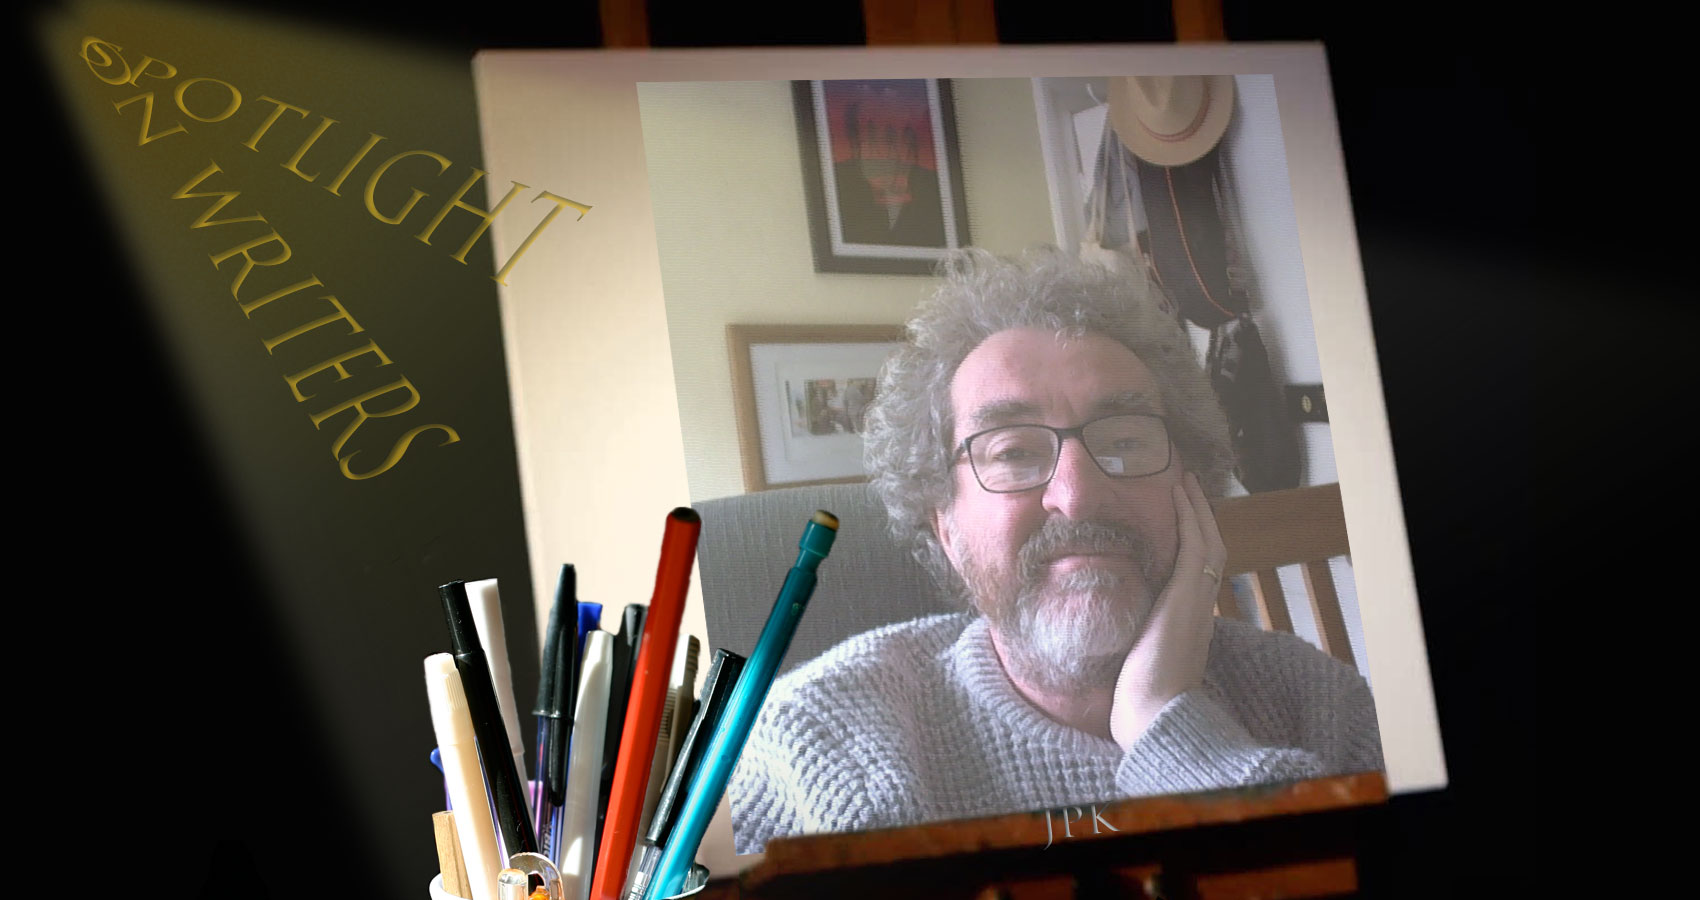 Spotlight On Writers - JPK, an interview at Spillwords.com